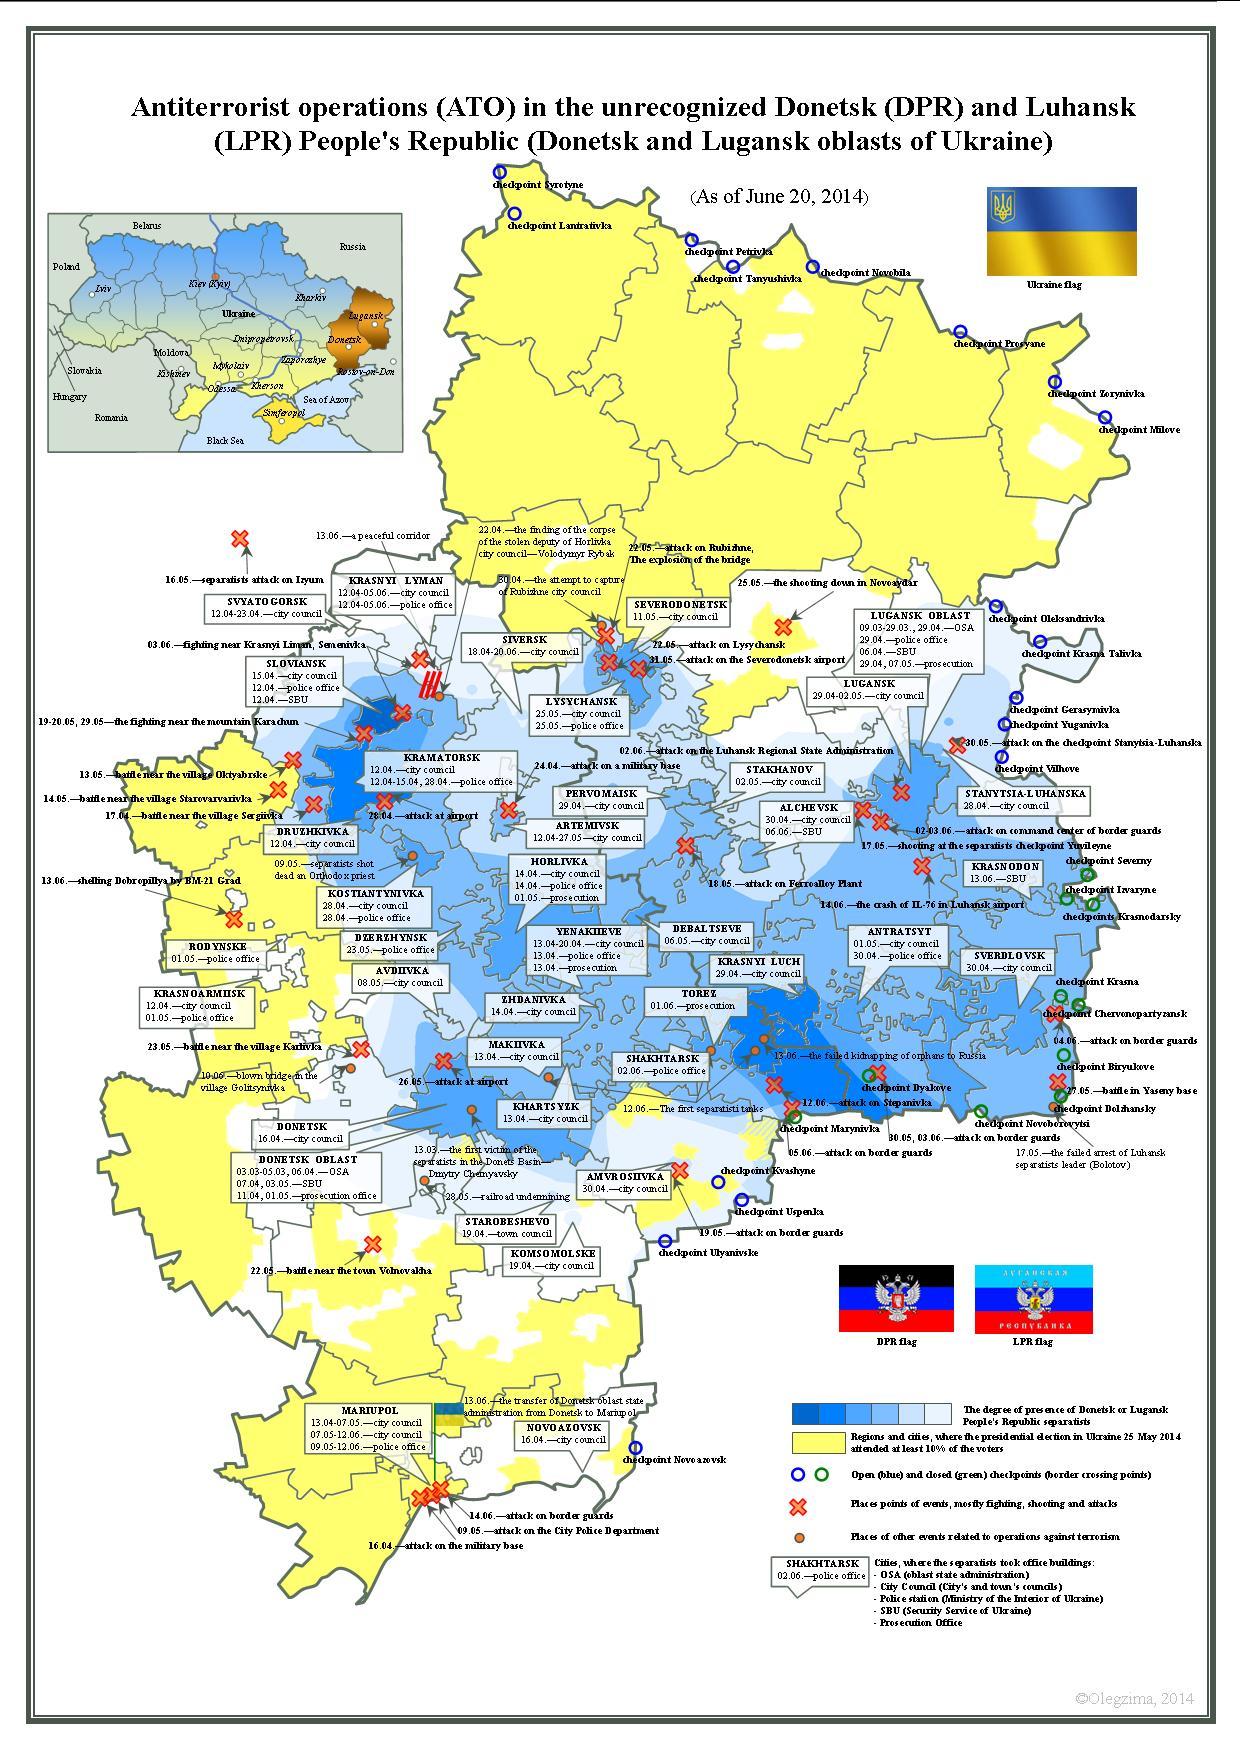 https://upload.wikimedia.org/wikipedia/commons/7/76/Donetsk_and_Luhansk_People_Republics_en.jpg